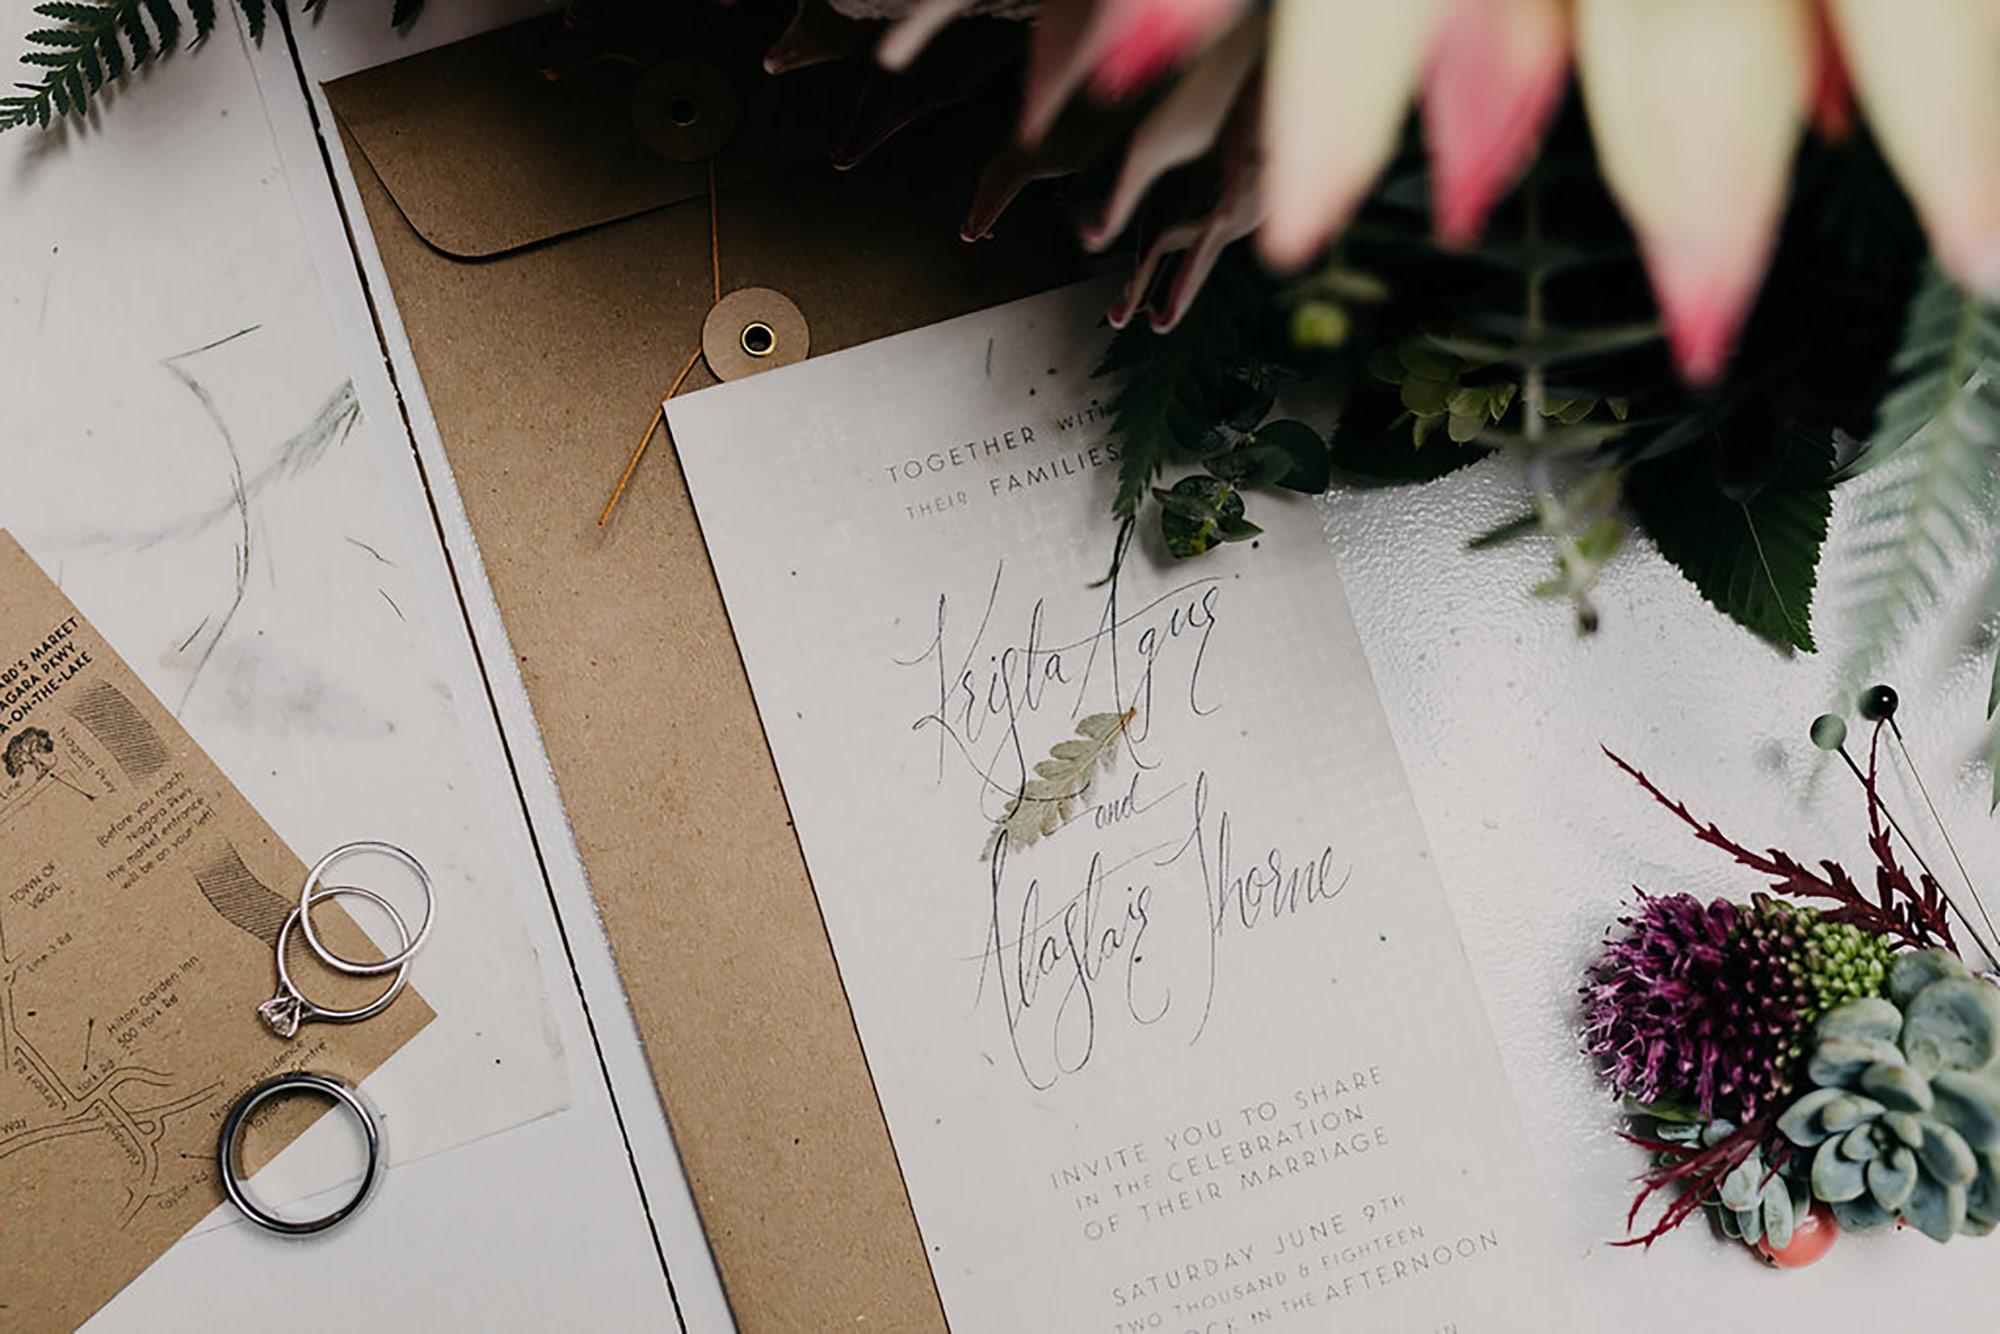 Kurtz-Orchards-Wedding-Niagara-wedding-Vineyard-Bride-Photography-by-Kayla-Rocca-002.JPG